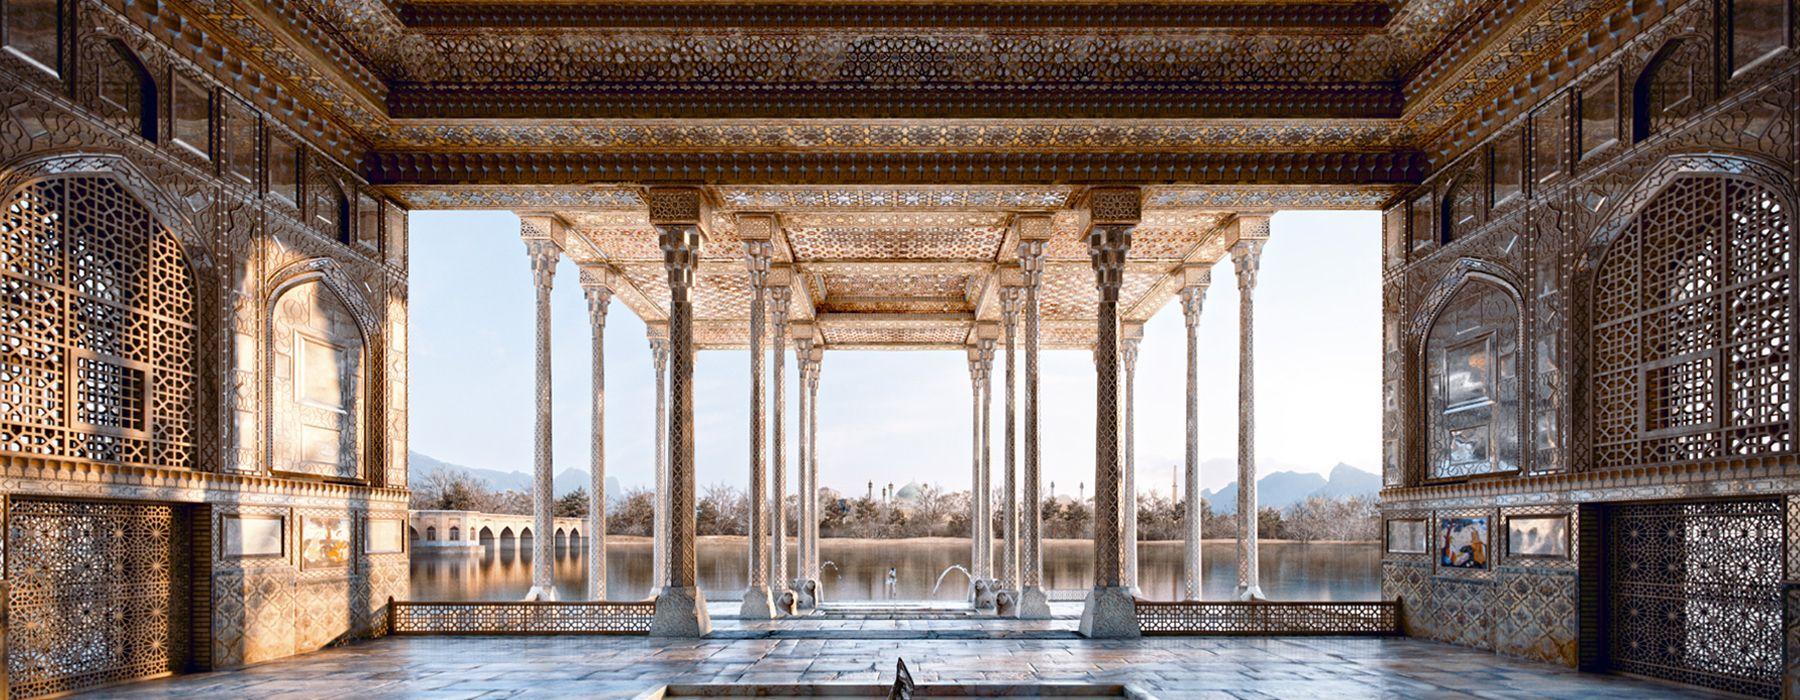 mohammad yazdi rad digitally reconstucts ayine khaneh palace in isfahan, iran